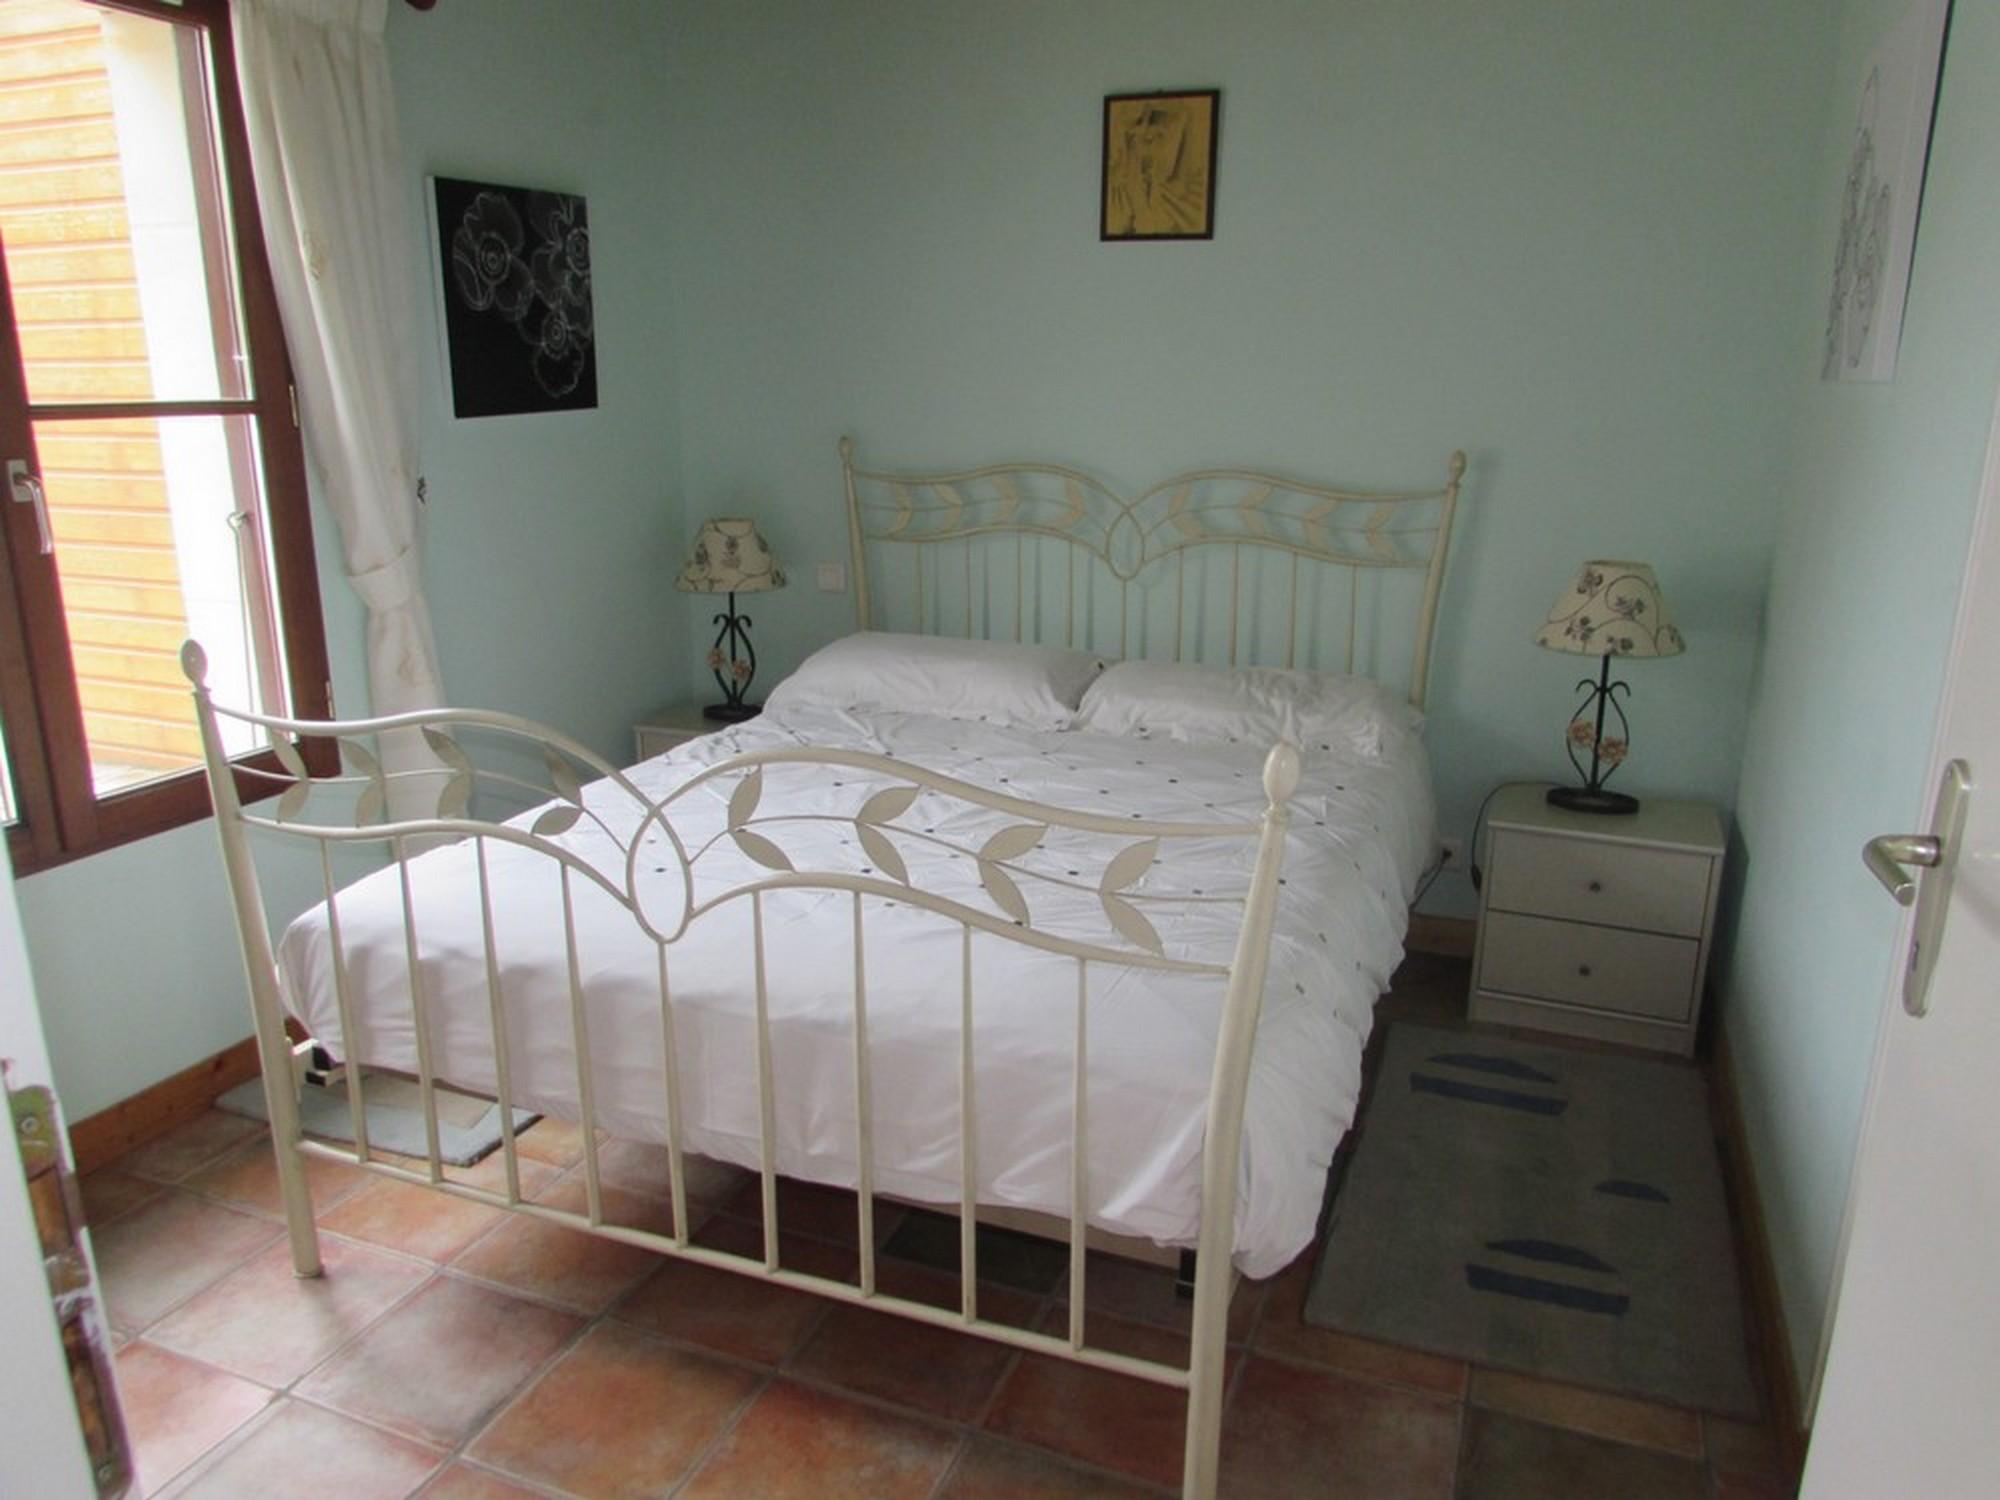 meuble-nenuphar-chambre-nalliers-85-hlo-3